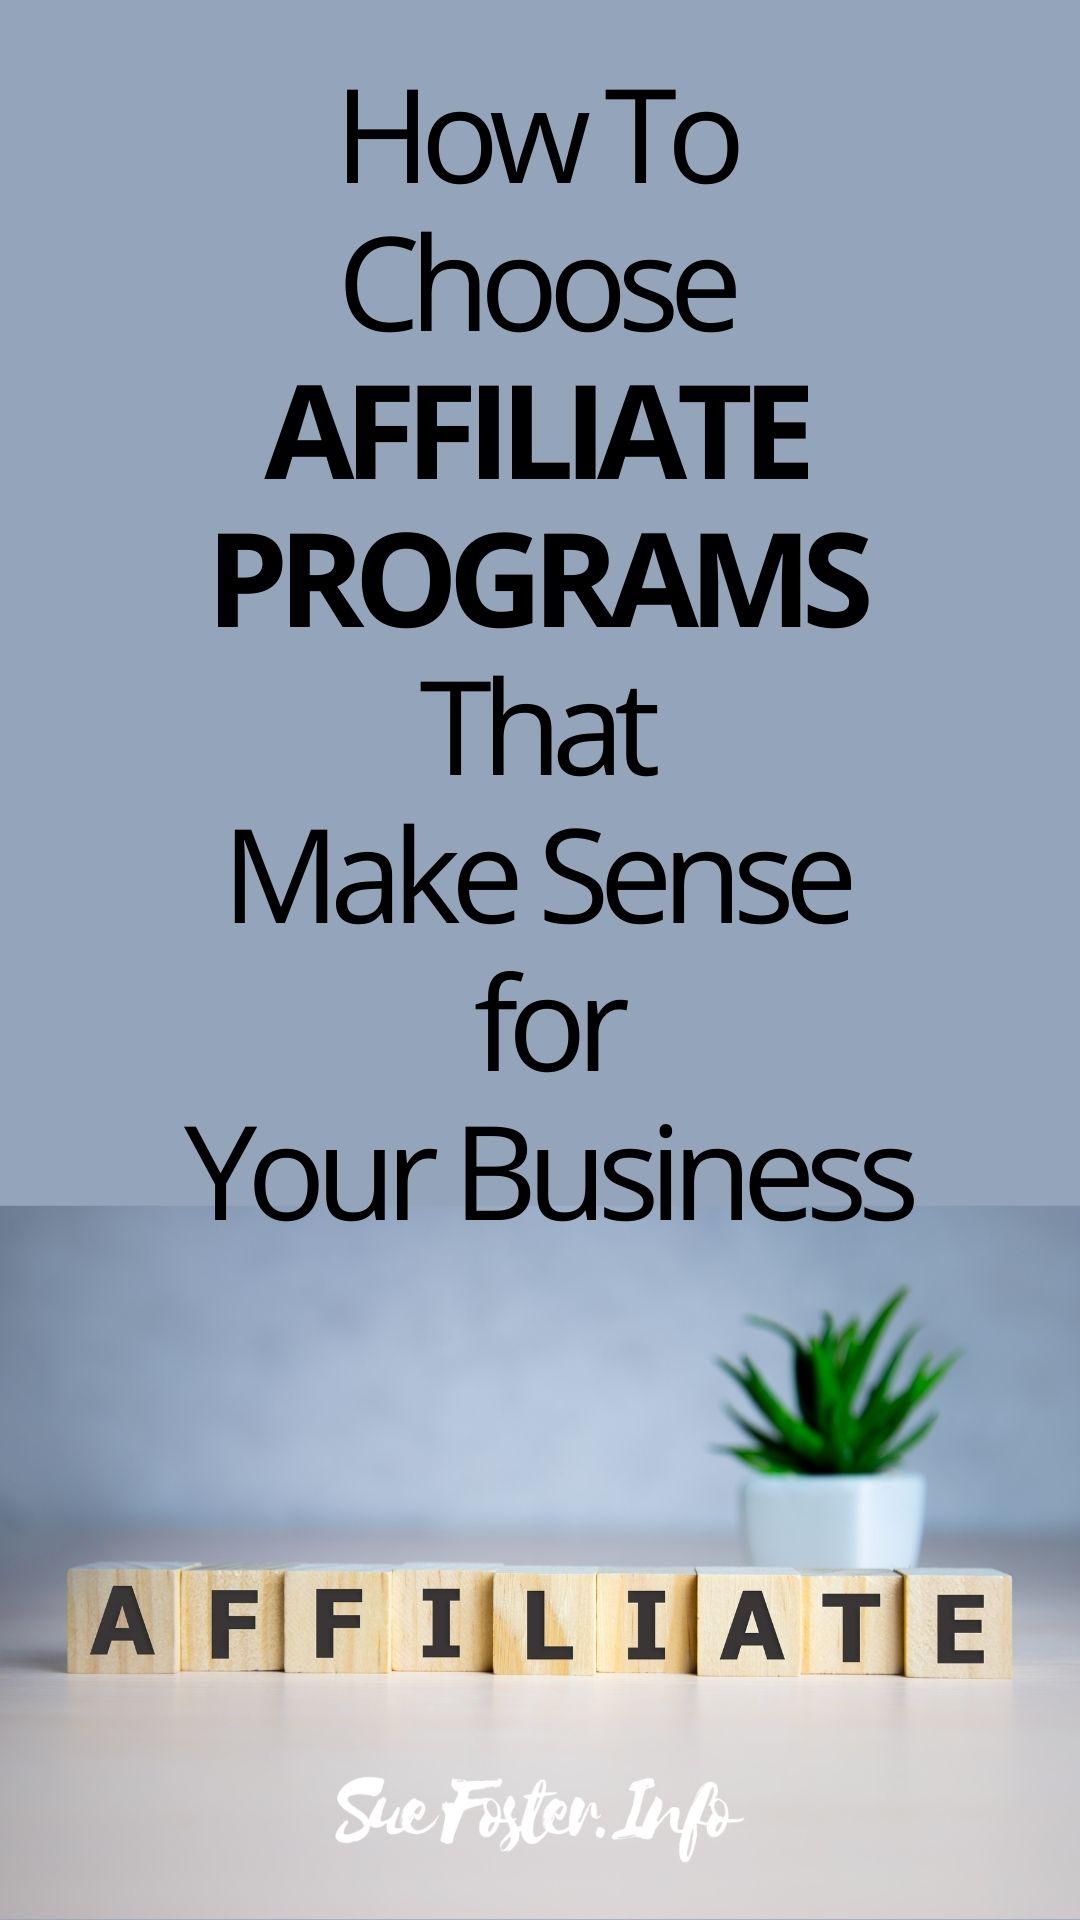 Tips on choosing affiliate programs that make sense for your business.